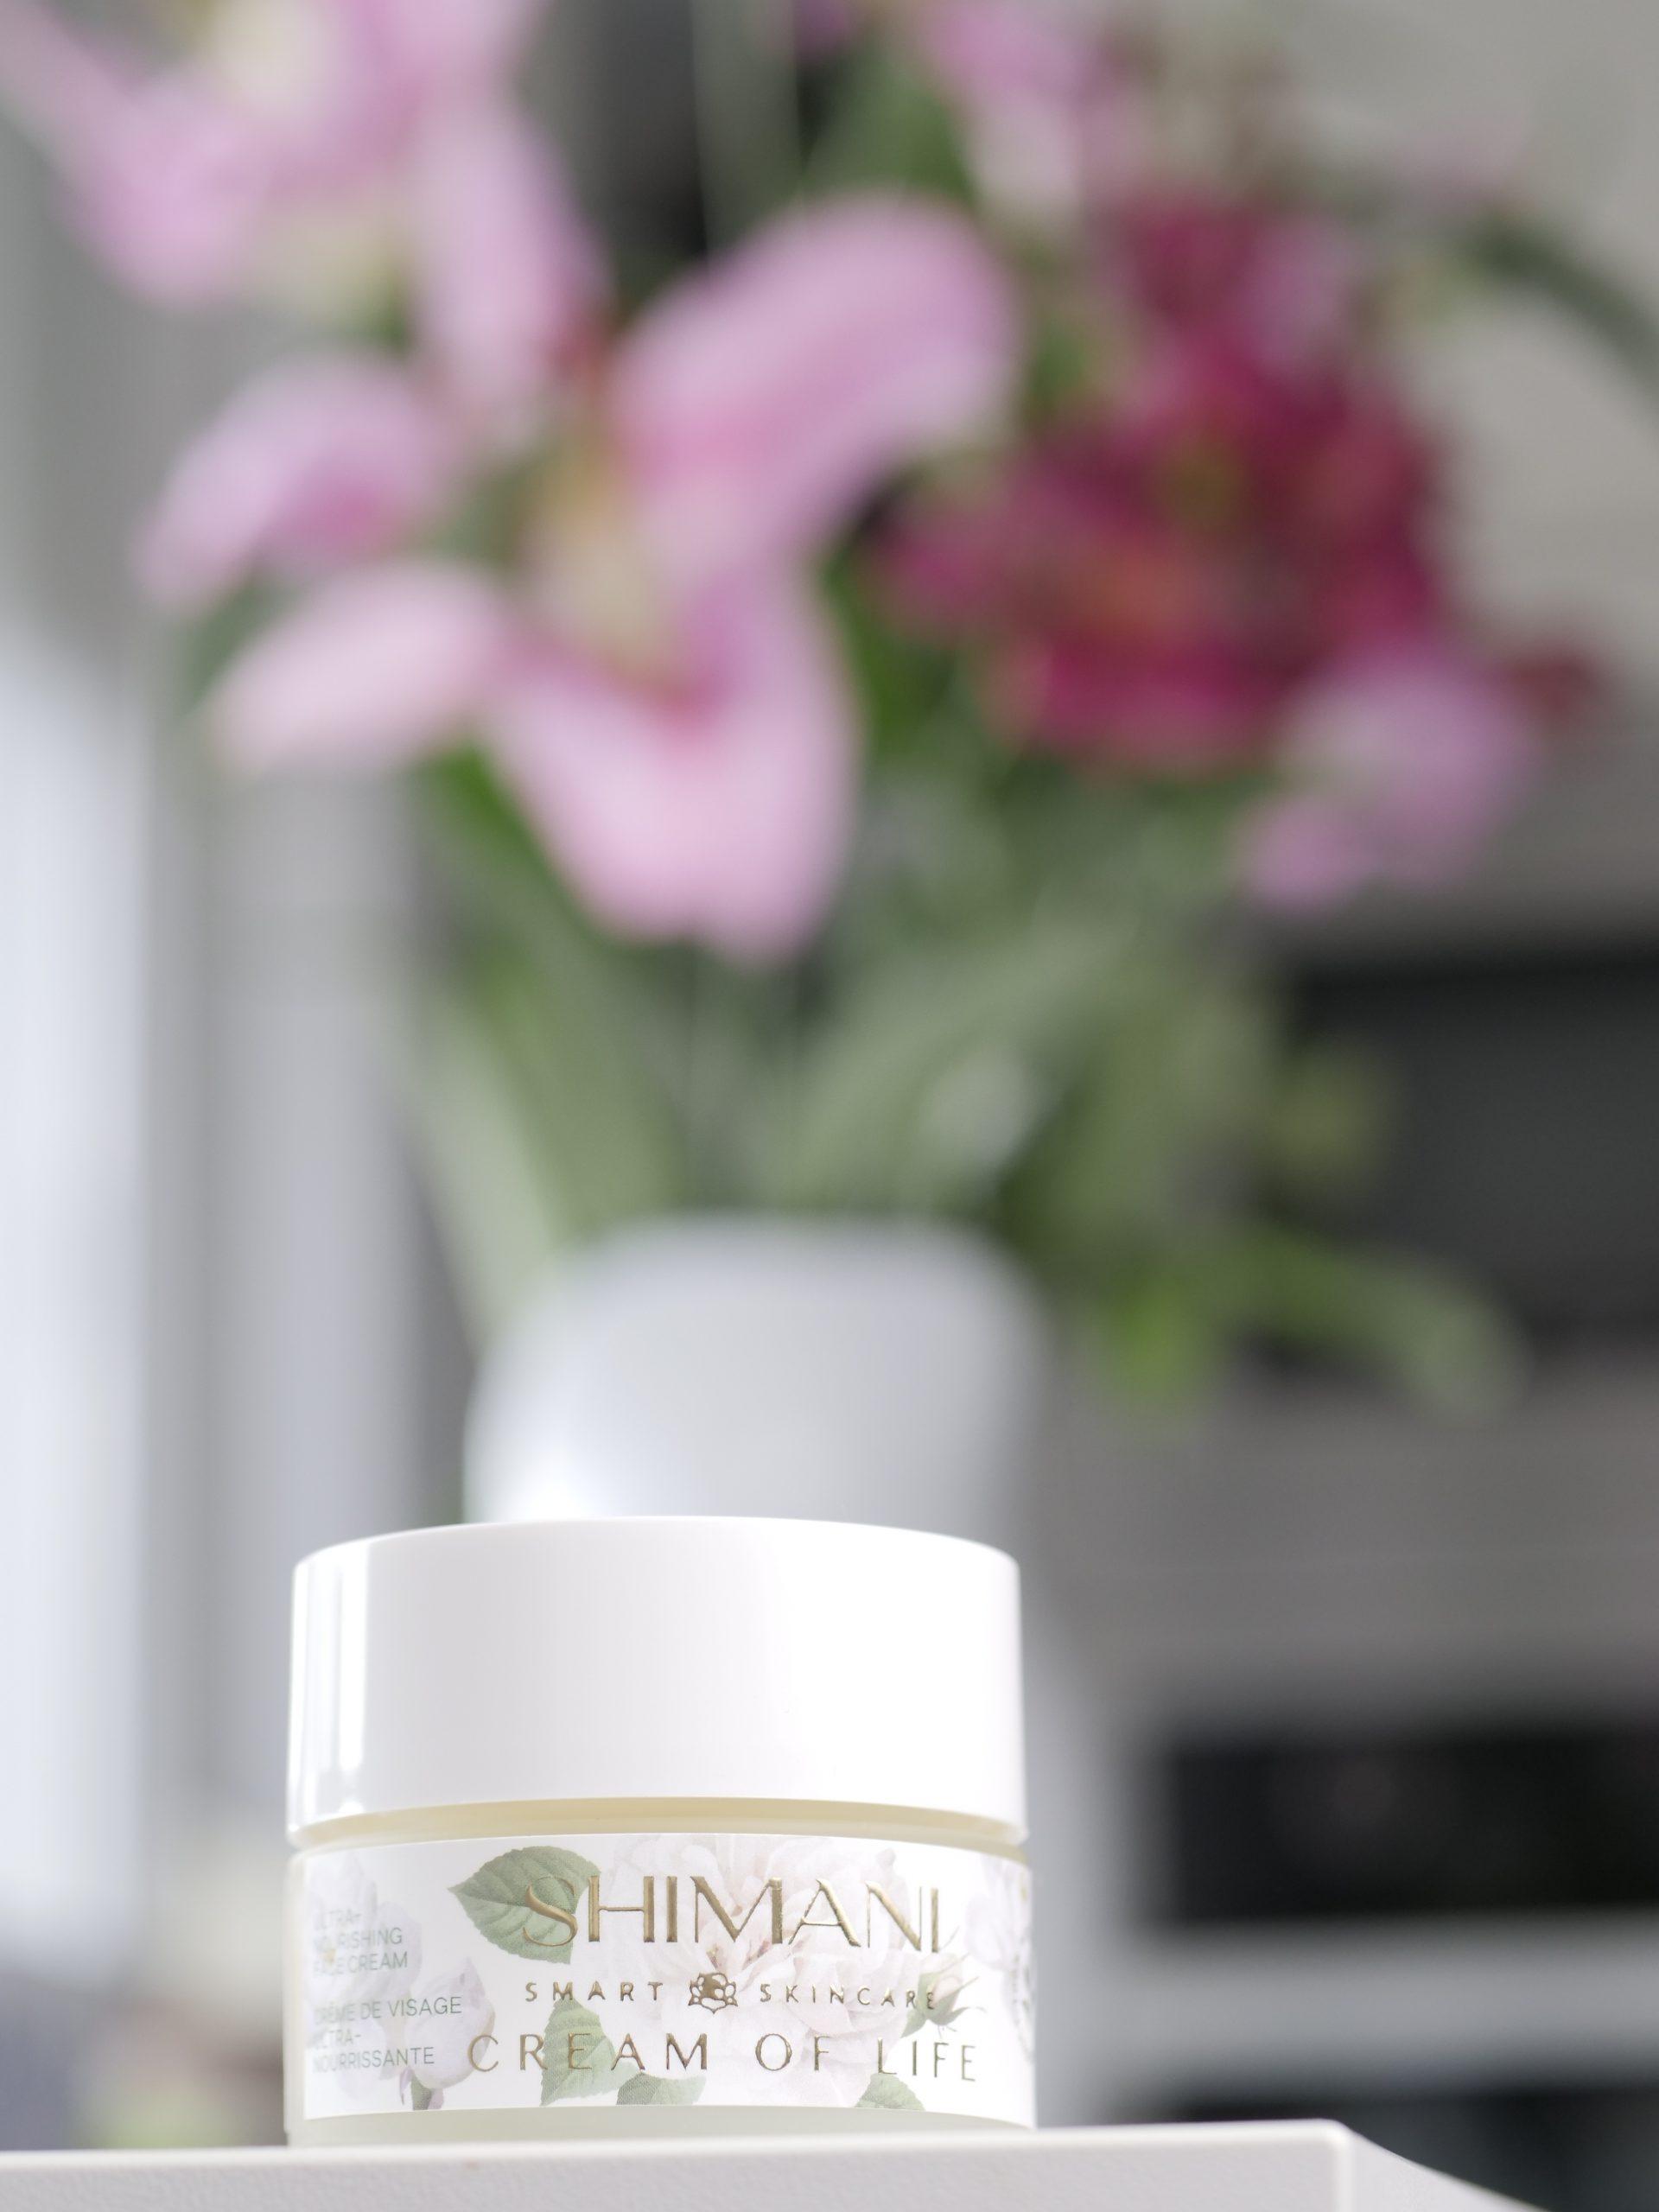 100%-naturalen-cream-of-life-shimani